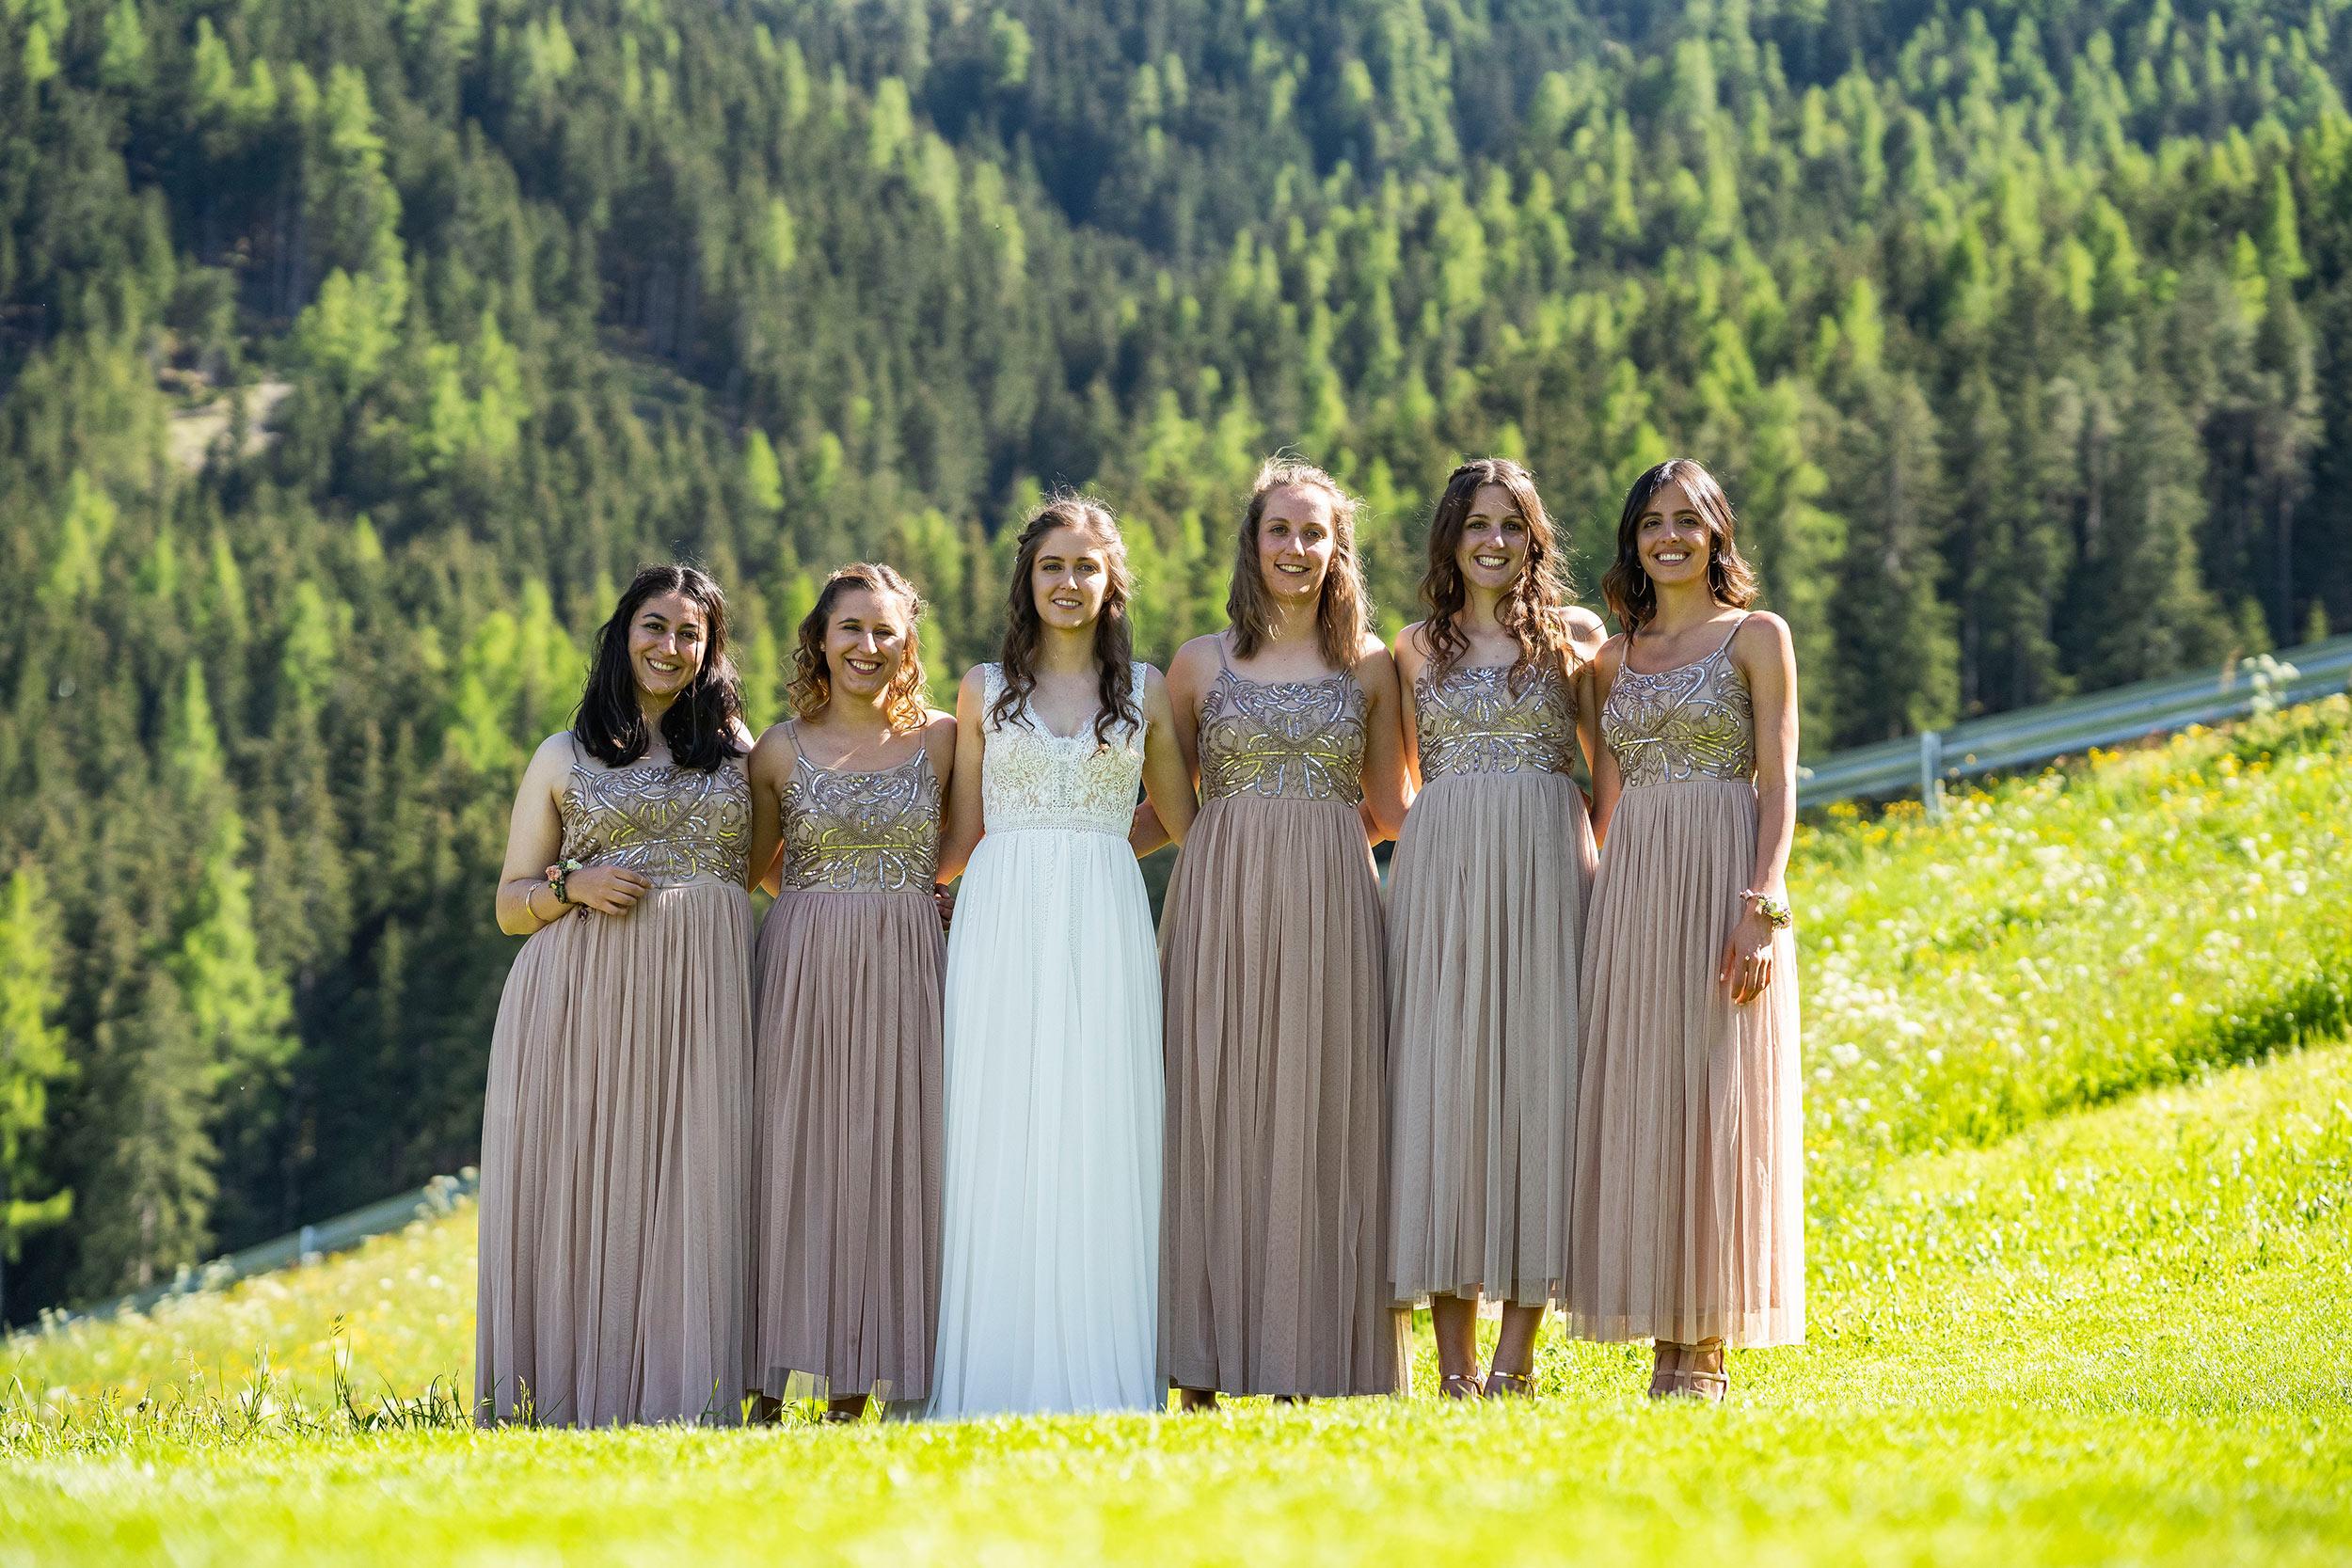 Evi_&_Christian_Hochzeit_01-06-2019_415